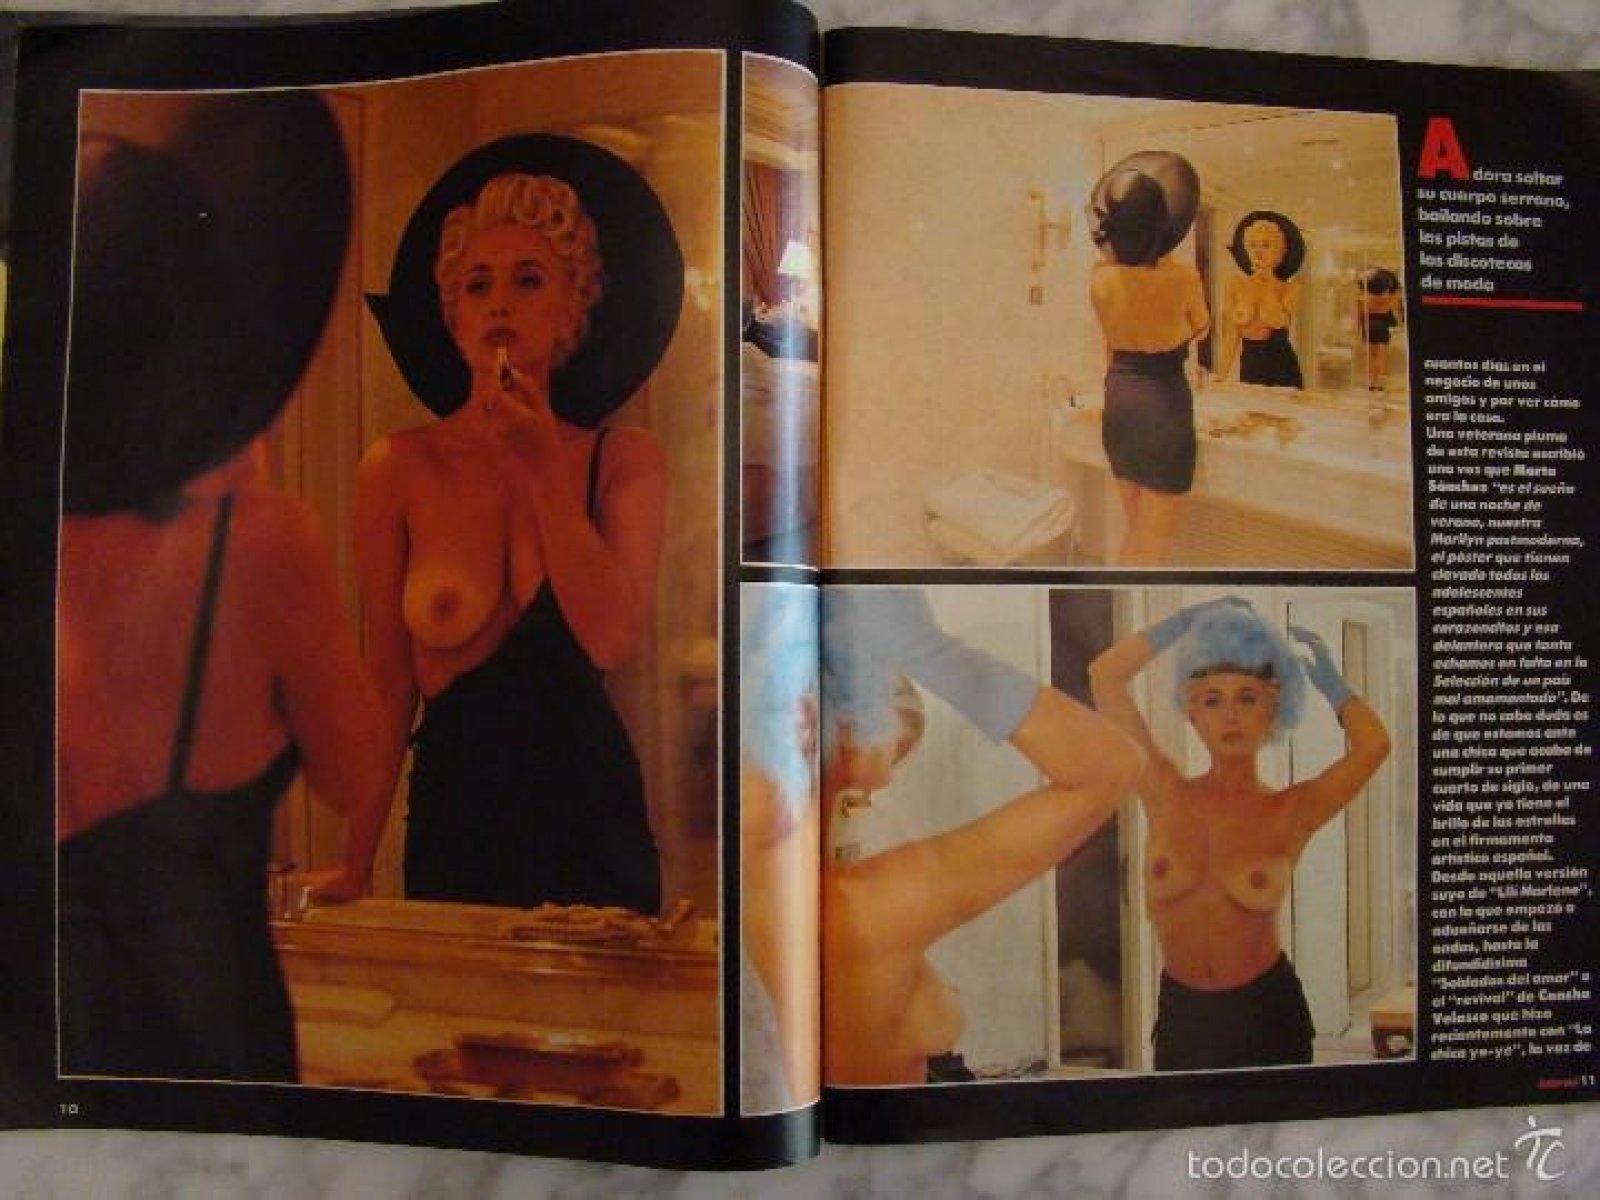 El reportaje para la revista 'Interviú' que erigió a Marta Sánchez como un sex symbol español.